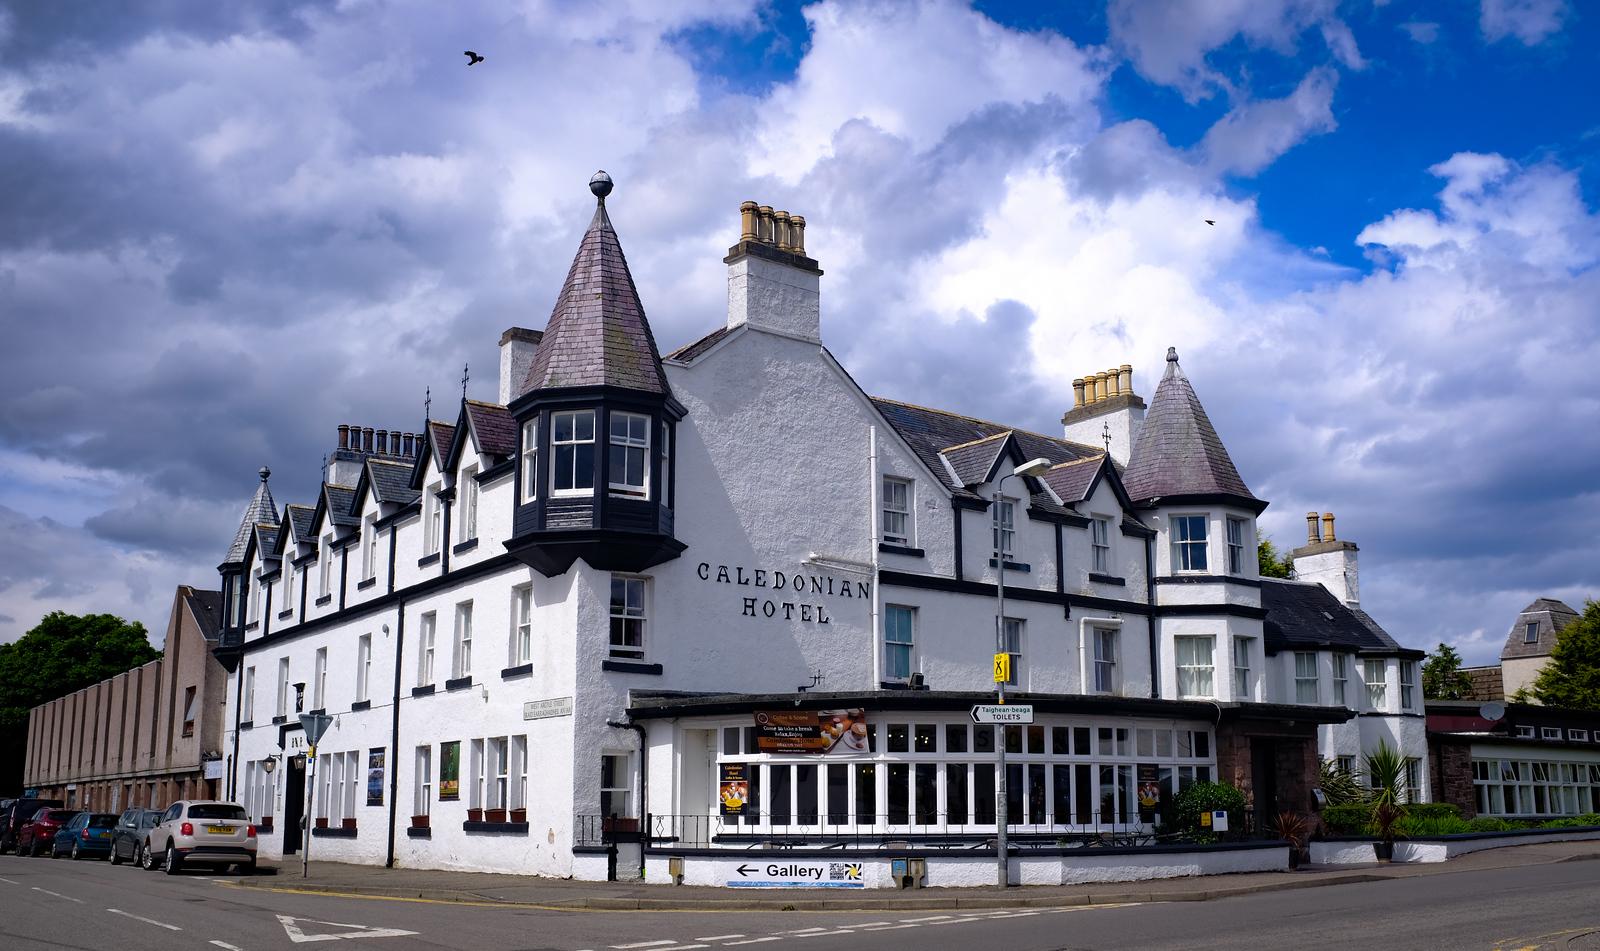 Caledonian Hotel Ullapool Scottish Highlands Jun 2017